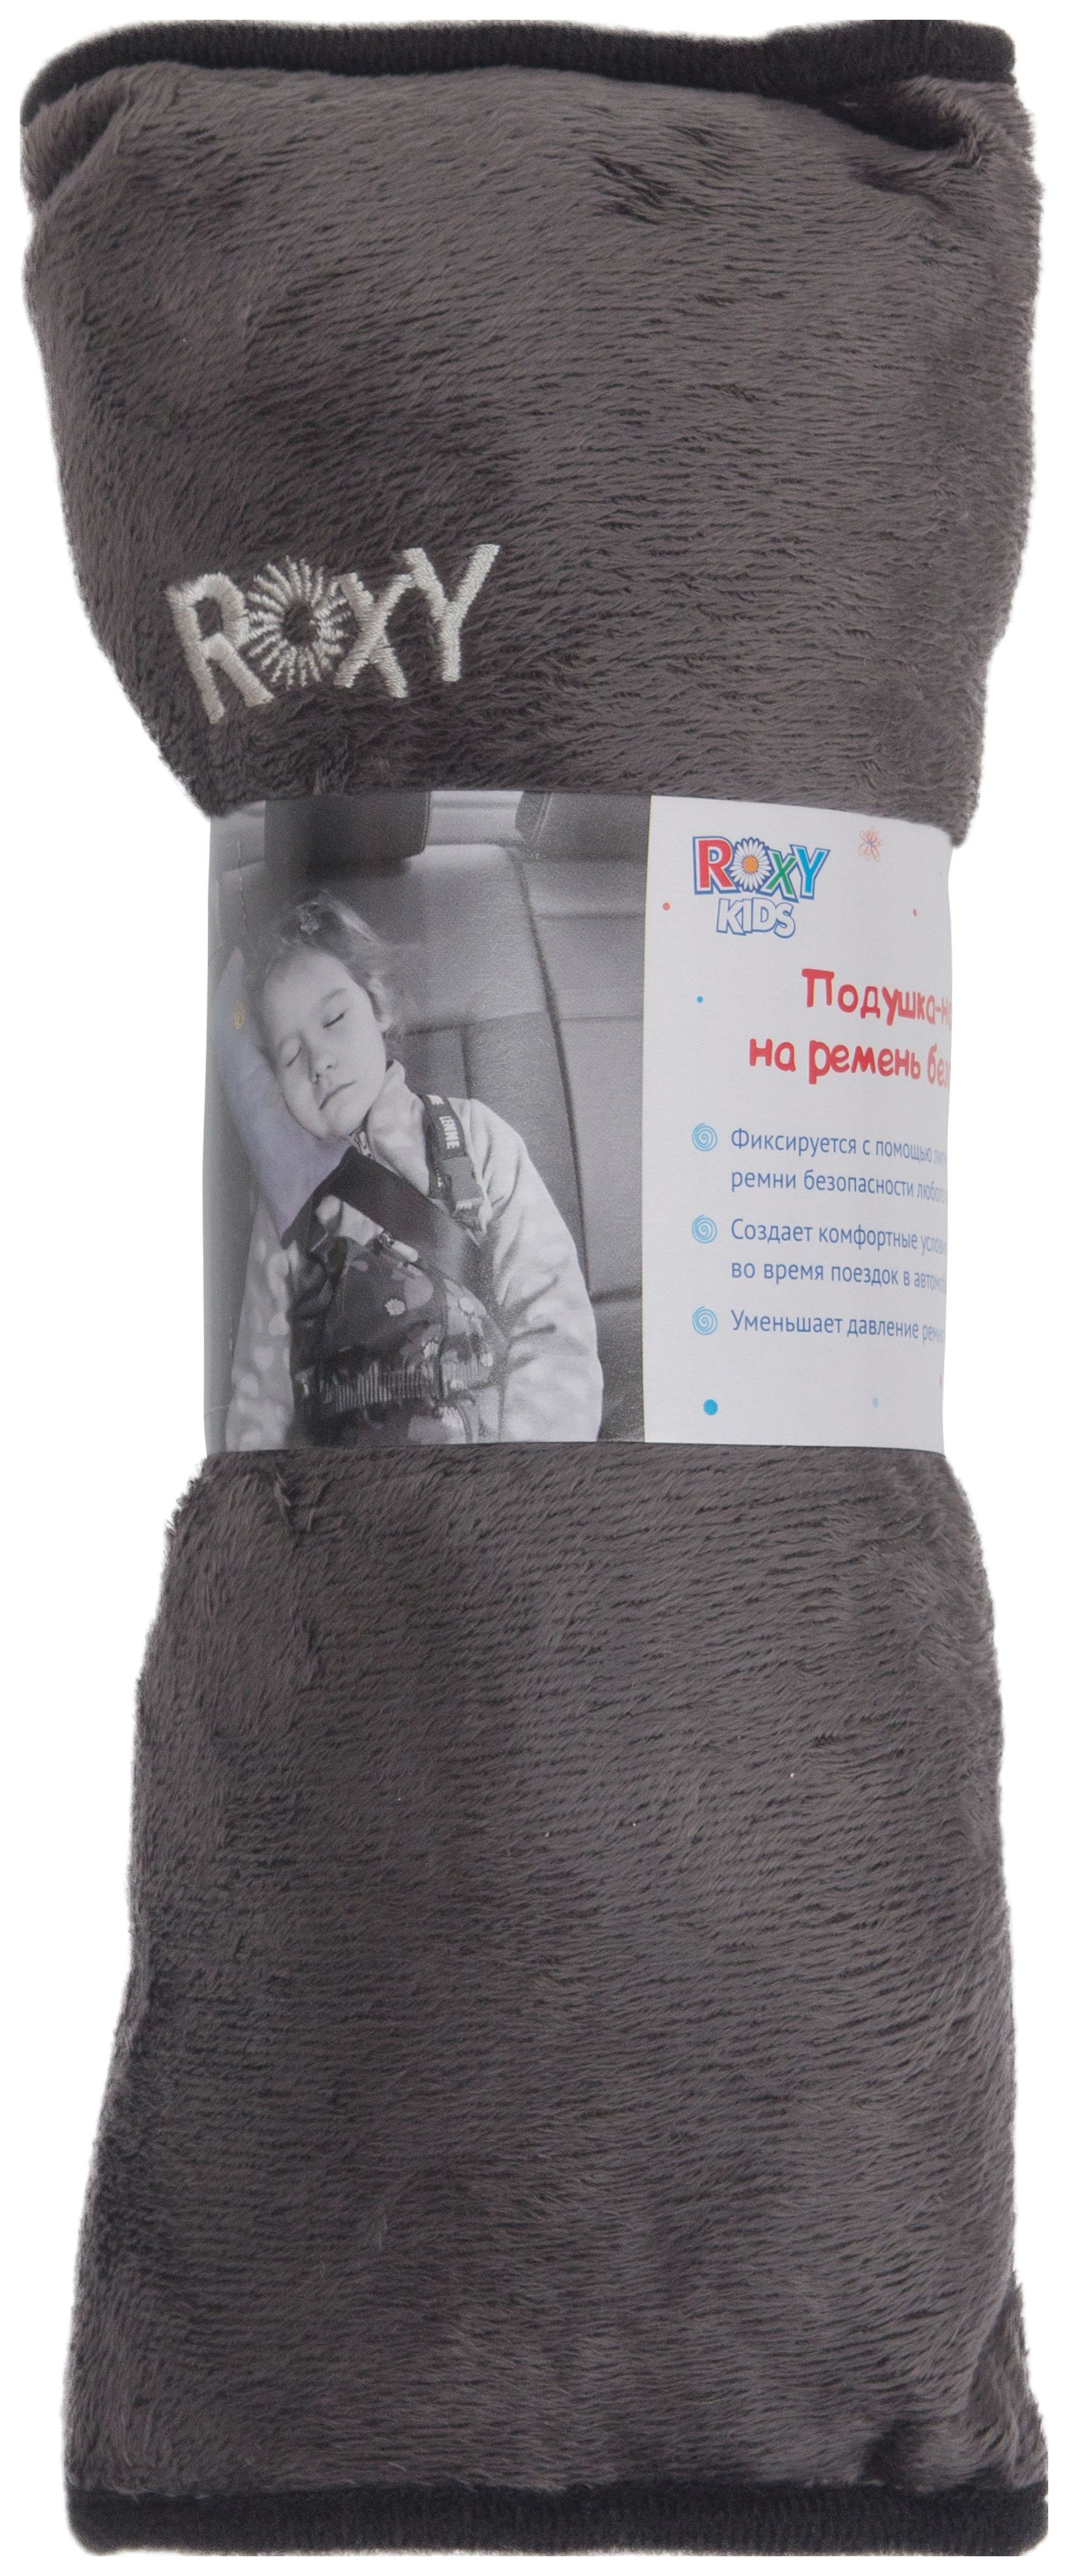 Подушка-накладка на ремень безопасности Roxy-Kids